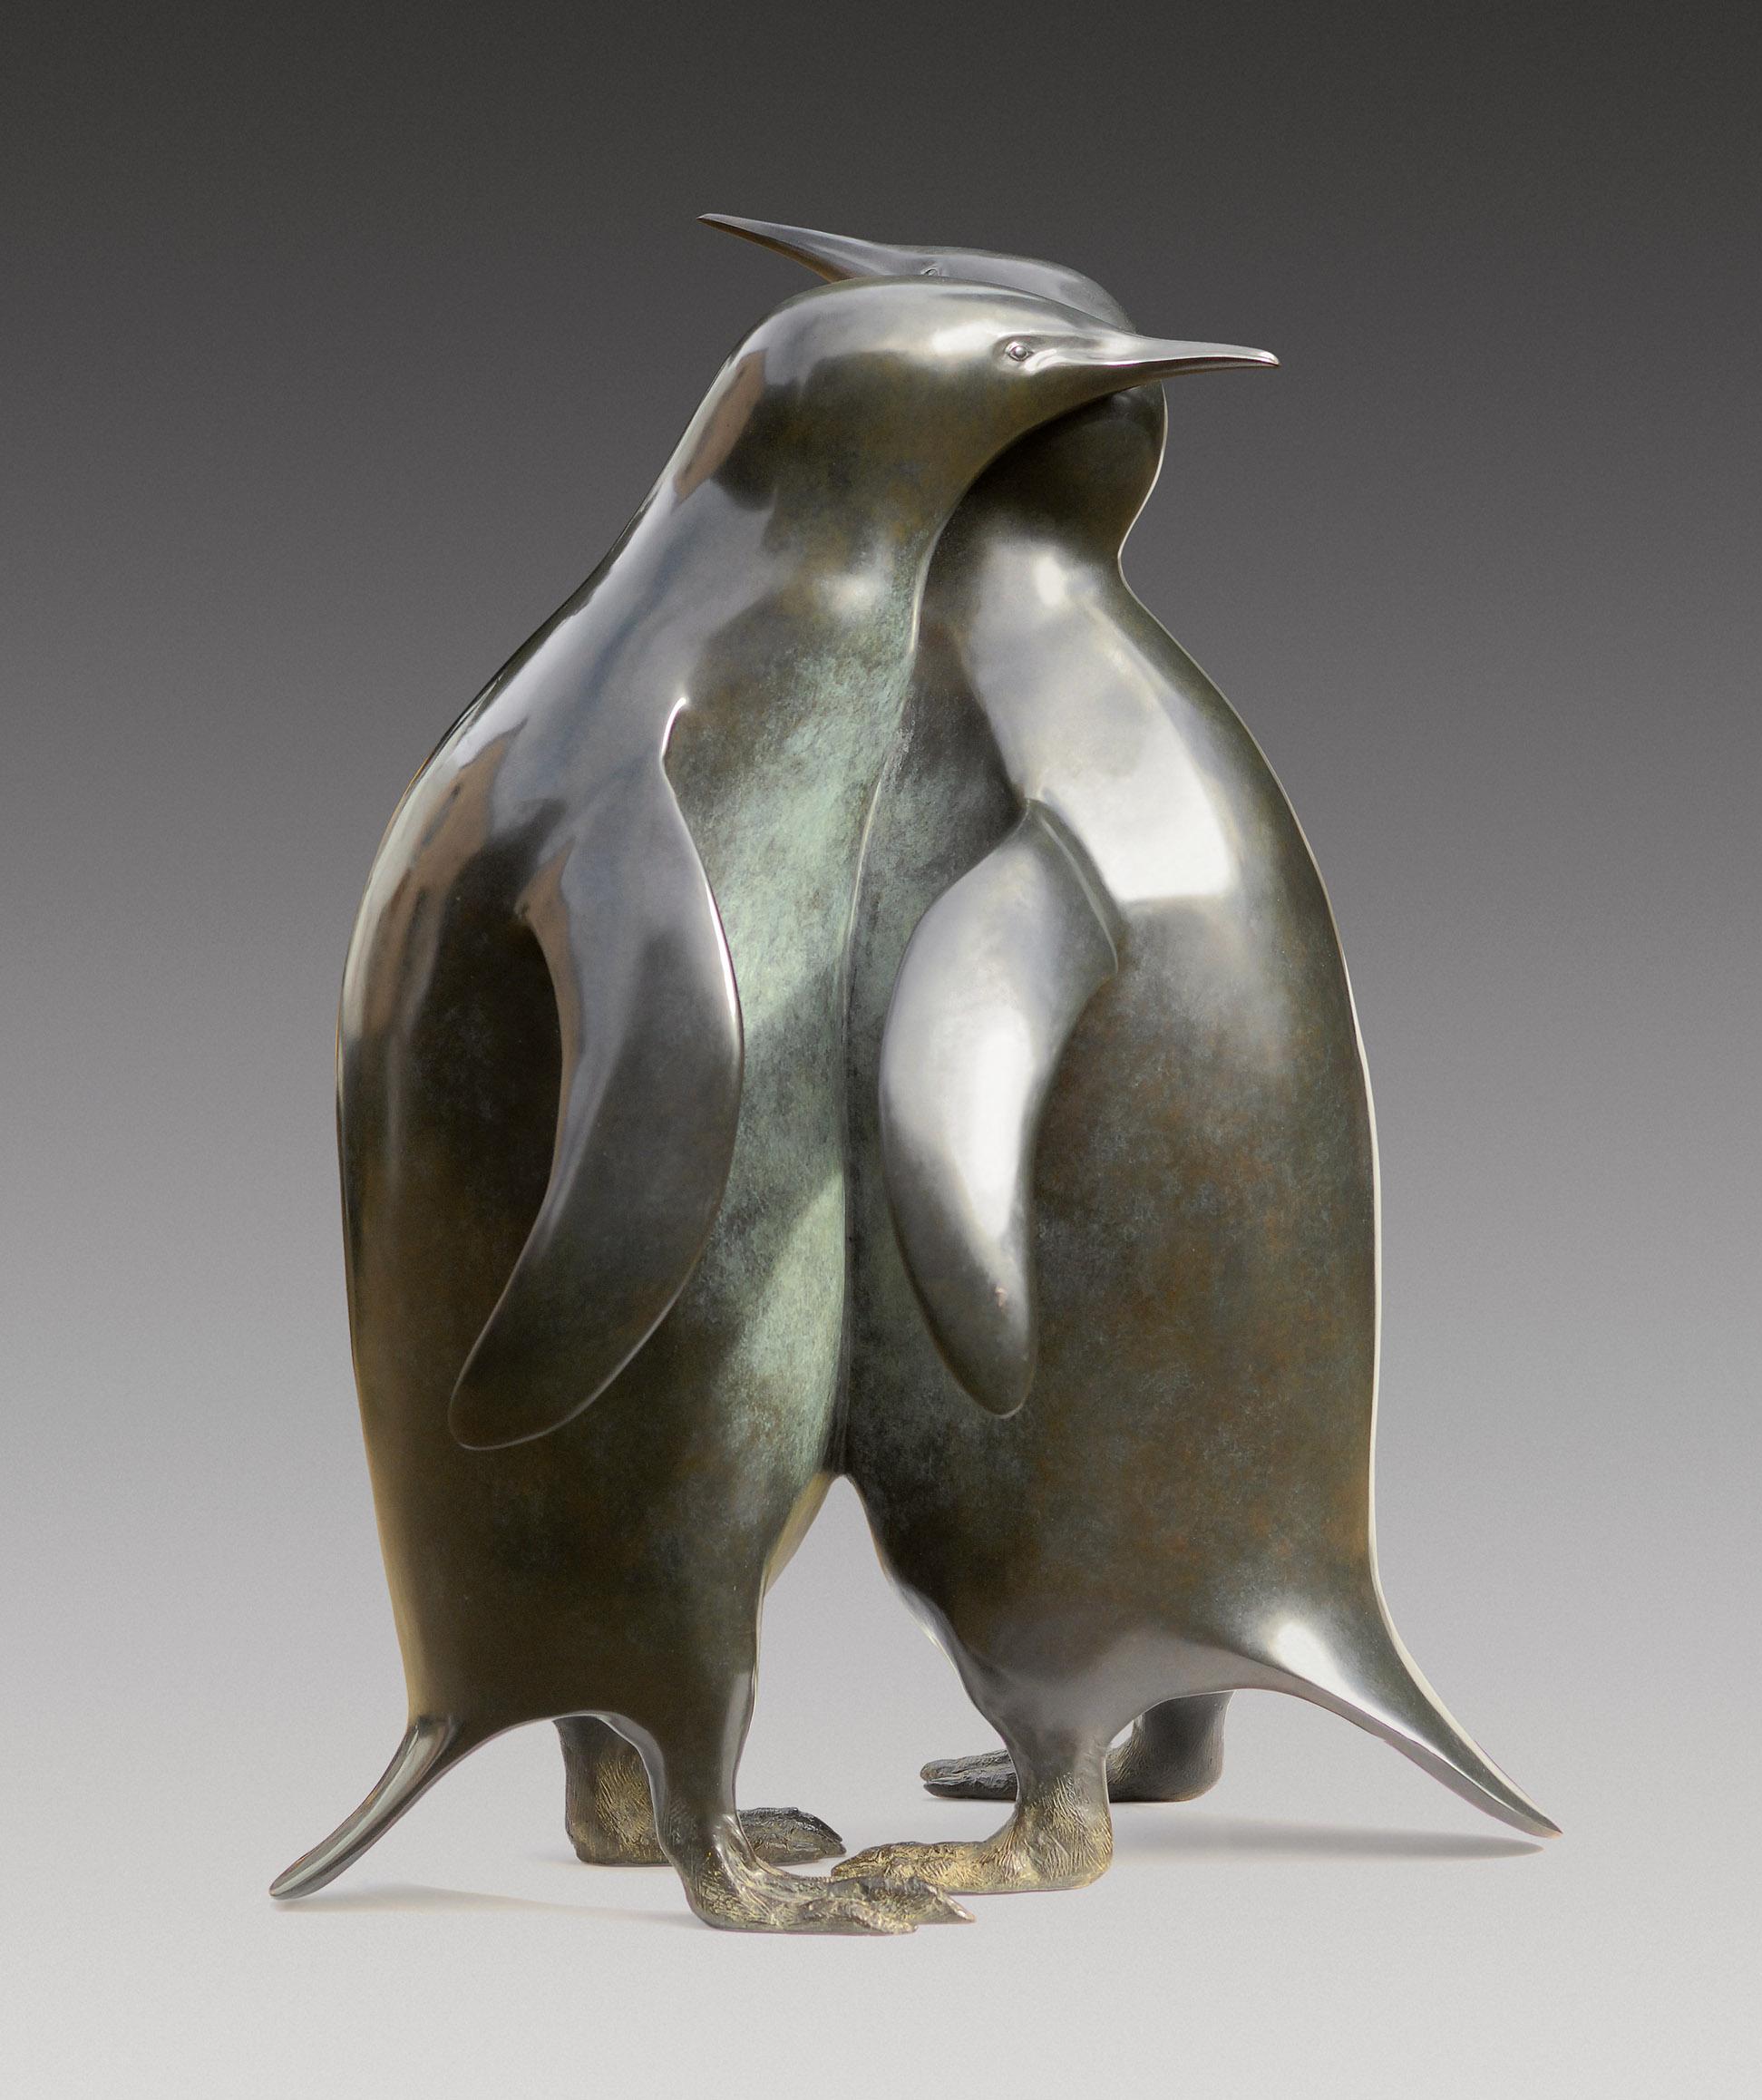 Lemonnier Tango royal bronze, H 50, 40, 40 cm